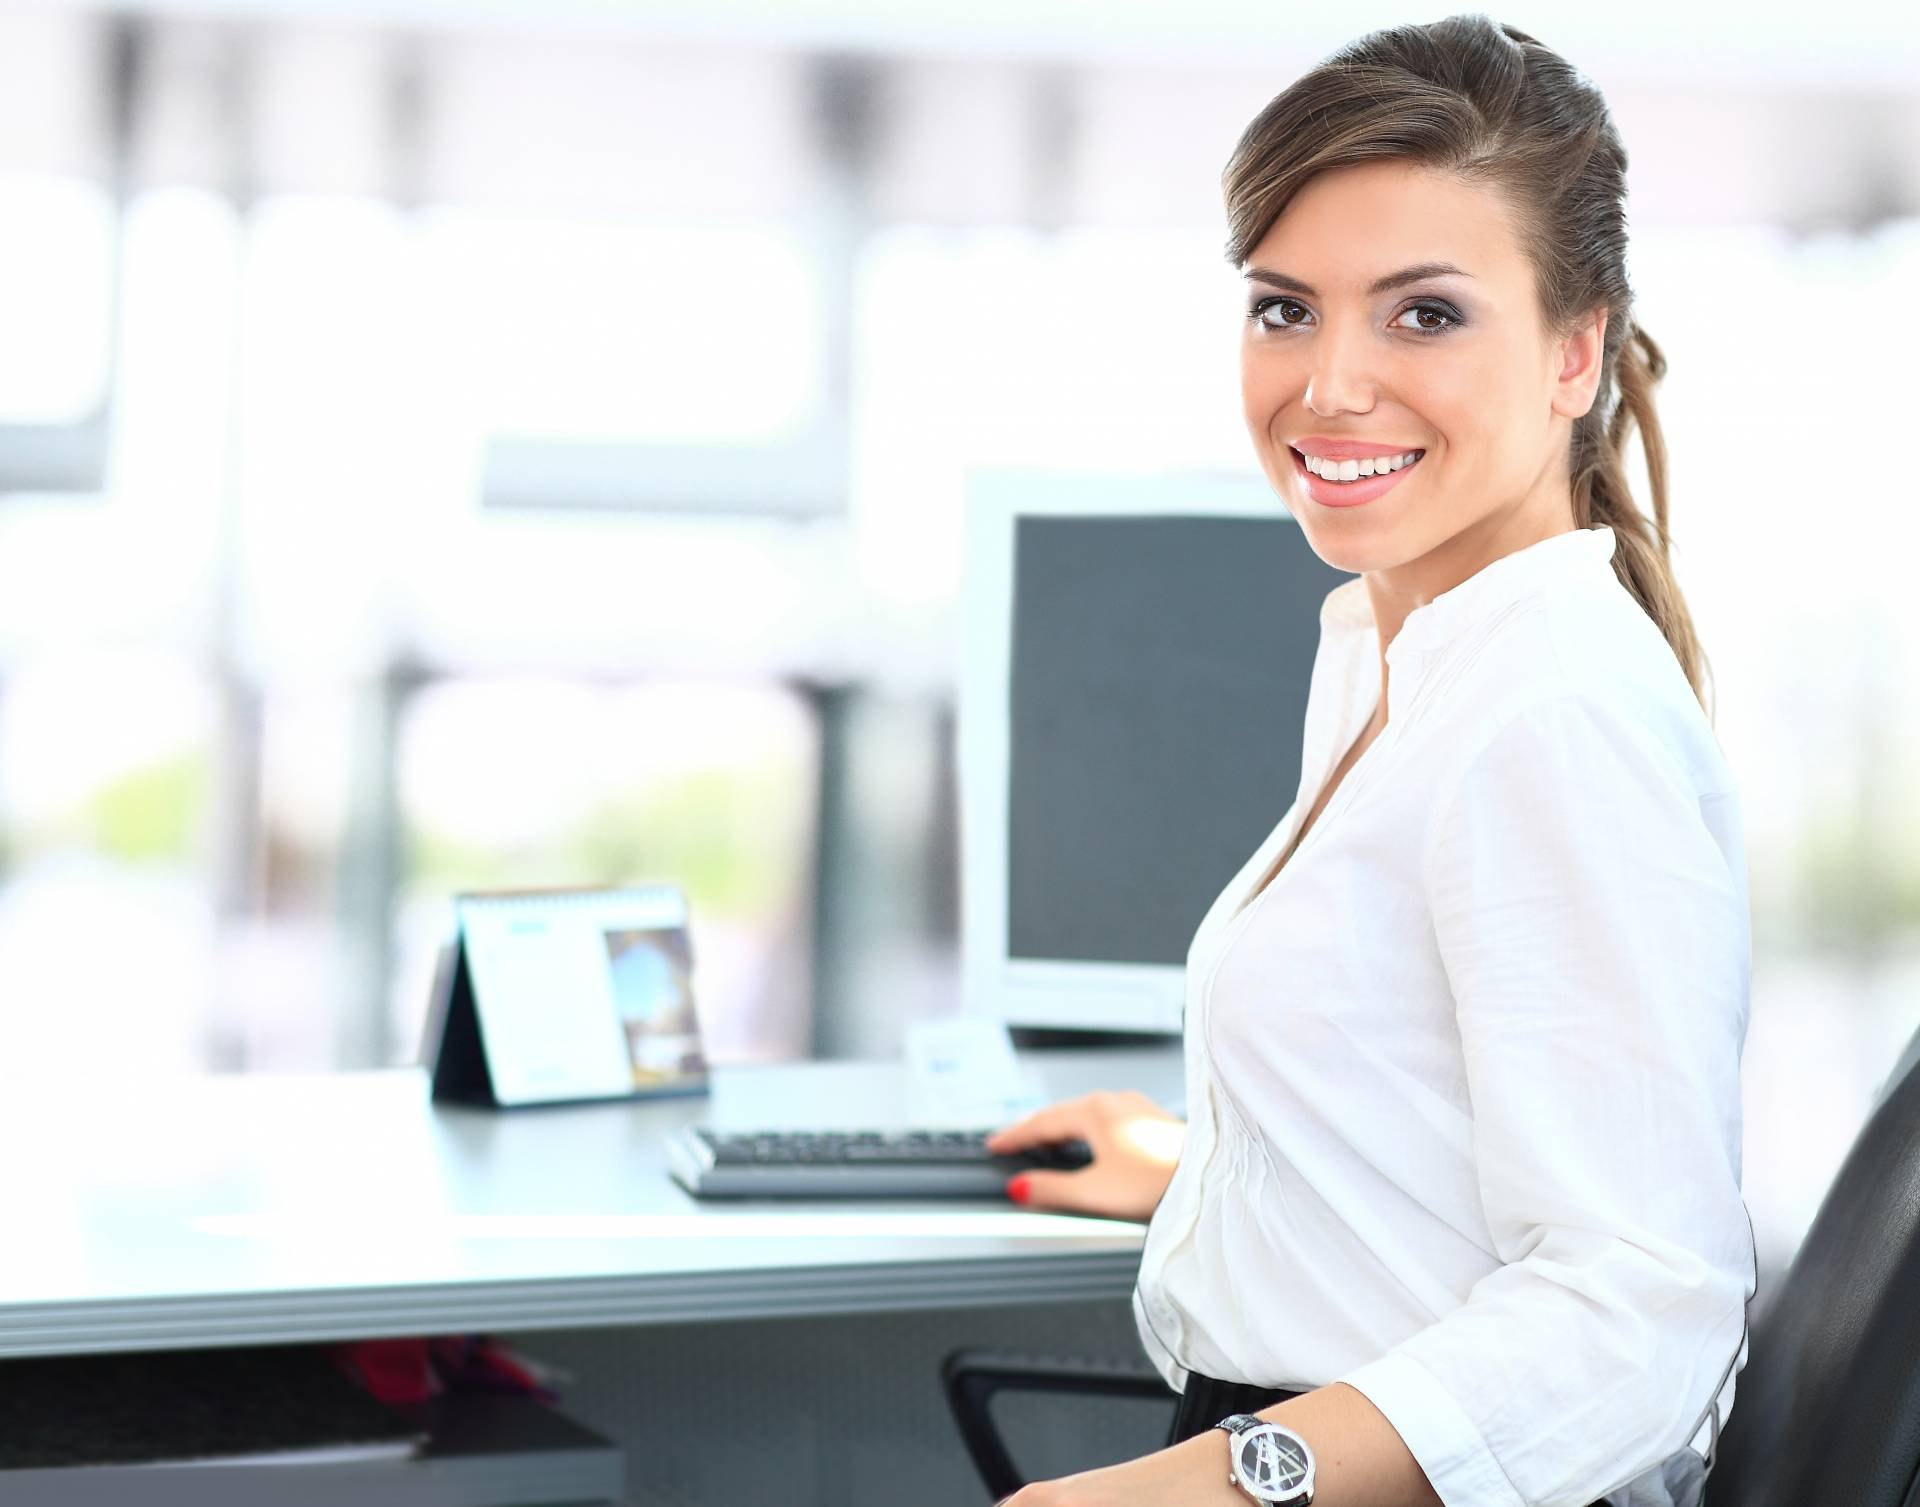 konsultacje-lekarskie-online